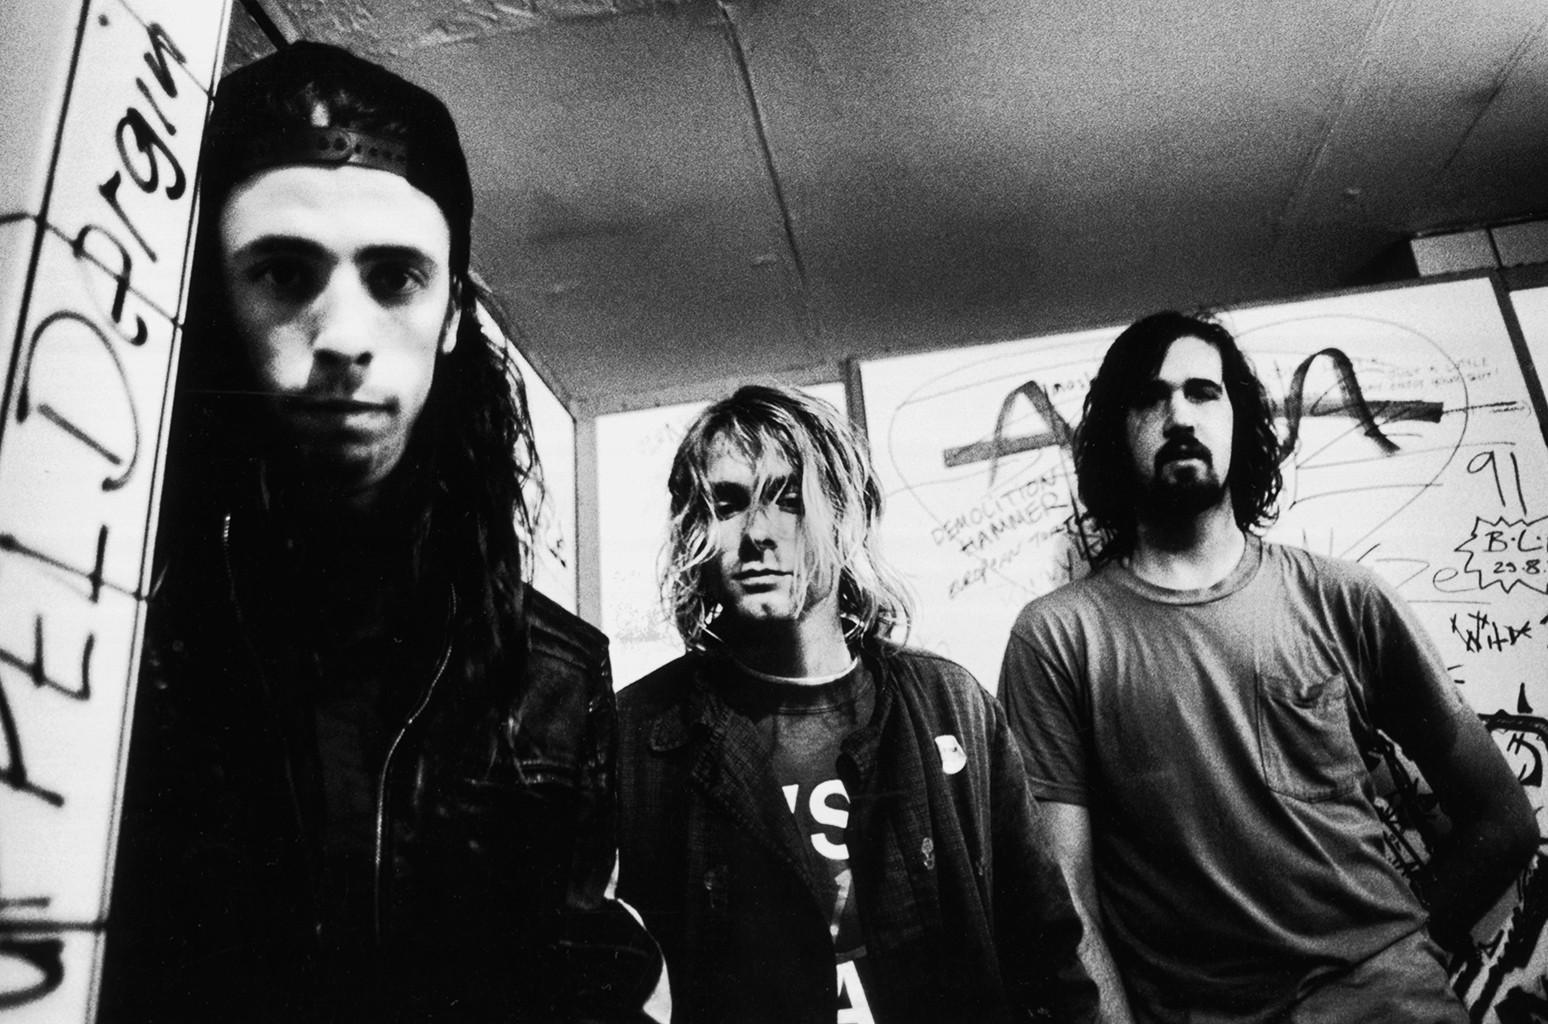 Dave Grohl, Kurt Coabin, Krist Novoselic of Nirvana photographed in 1991.